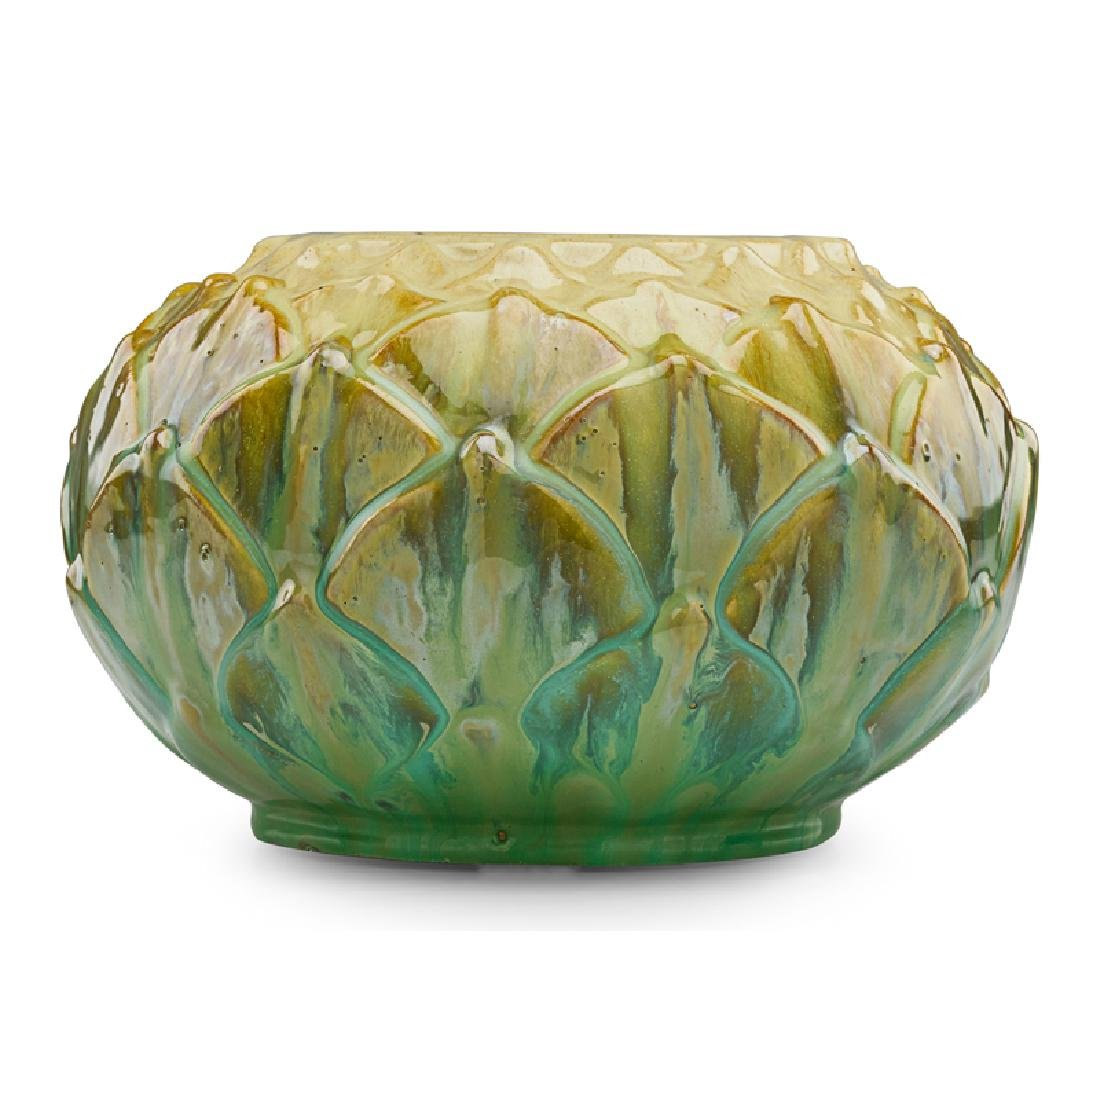 FULPER Artichoke vase - 2